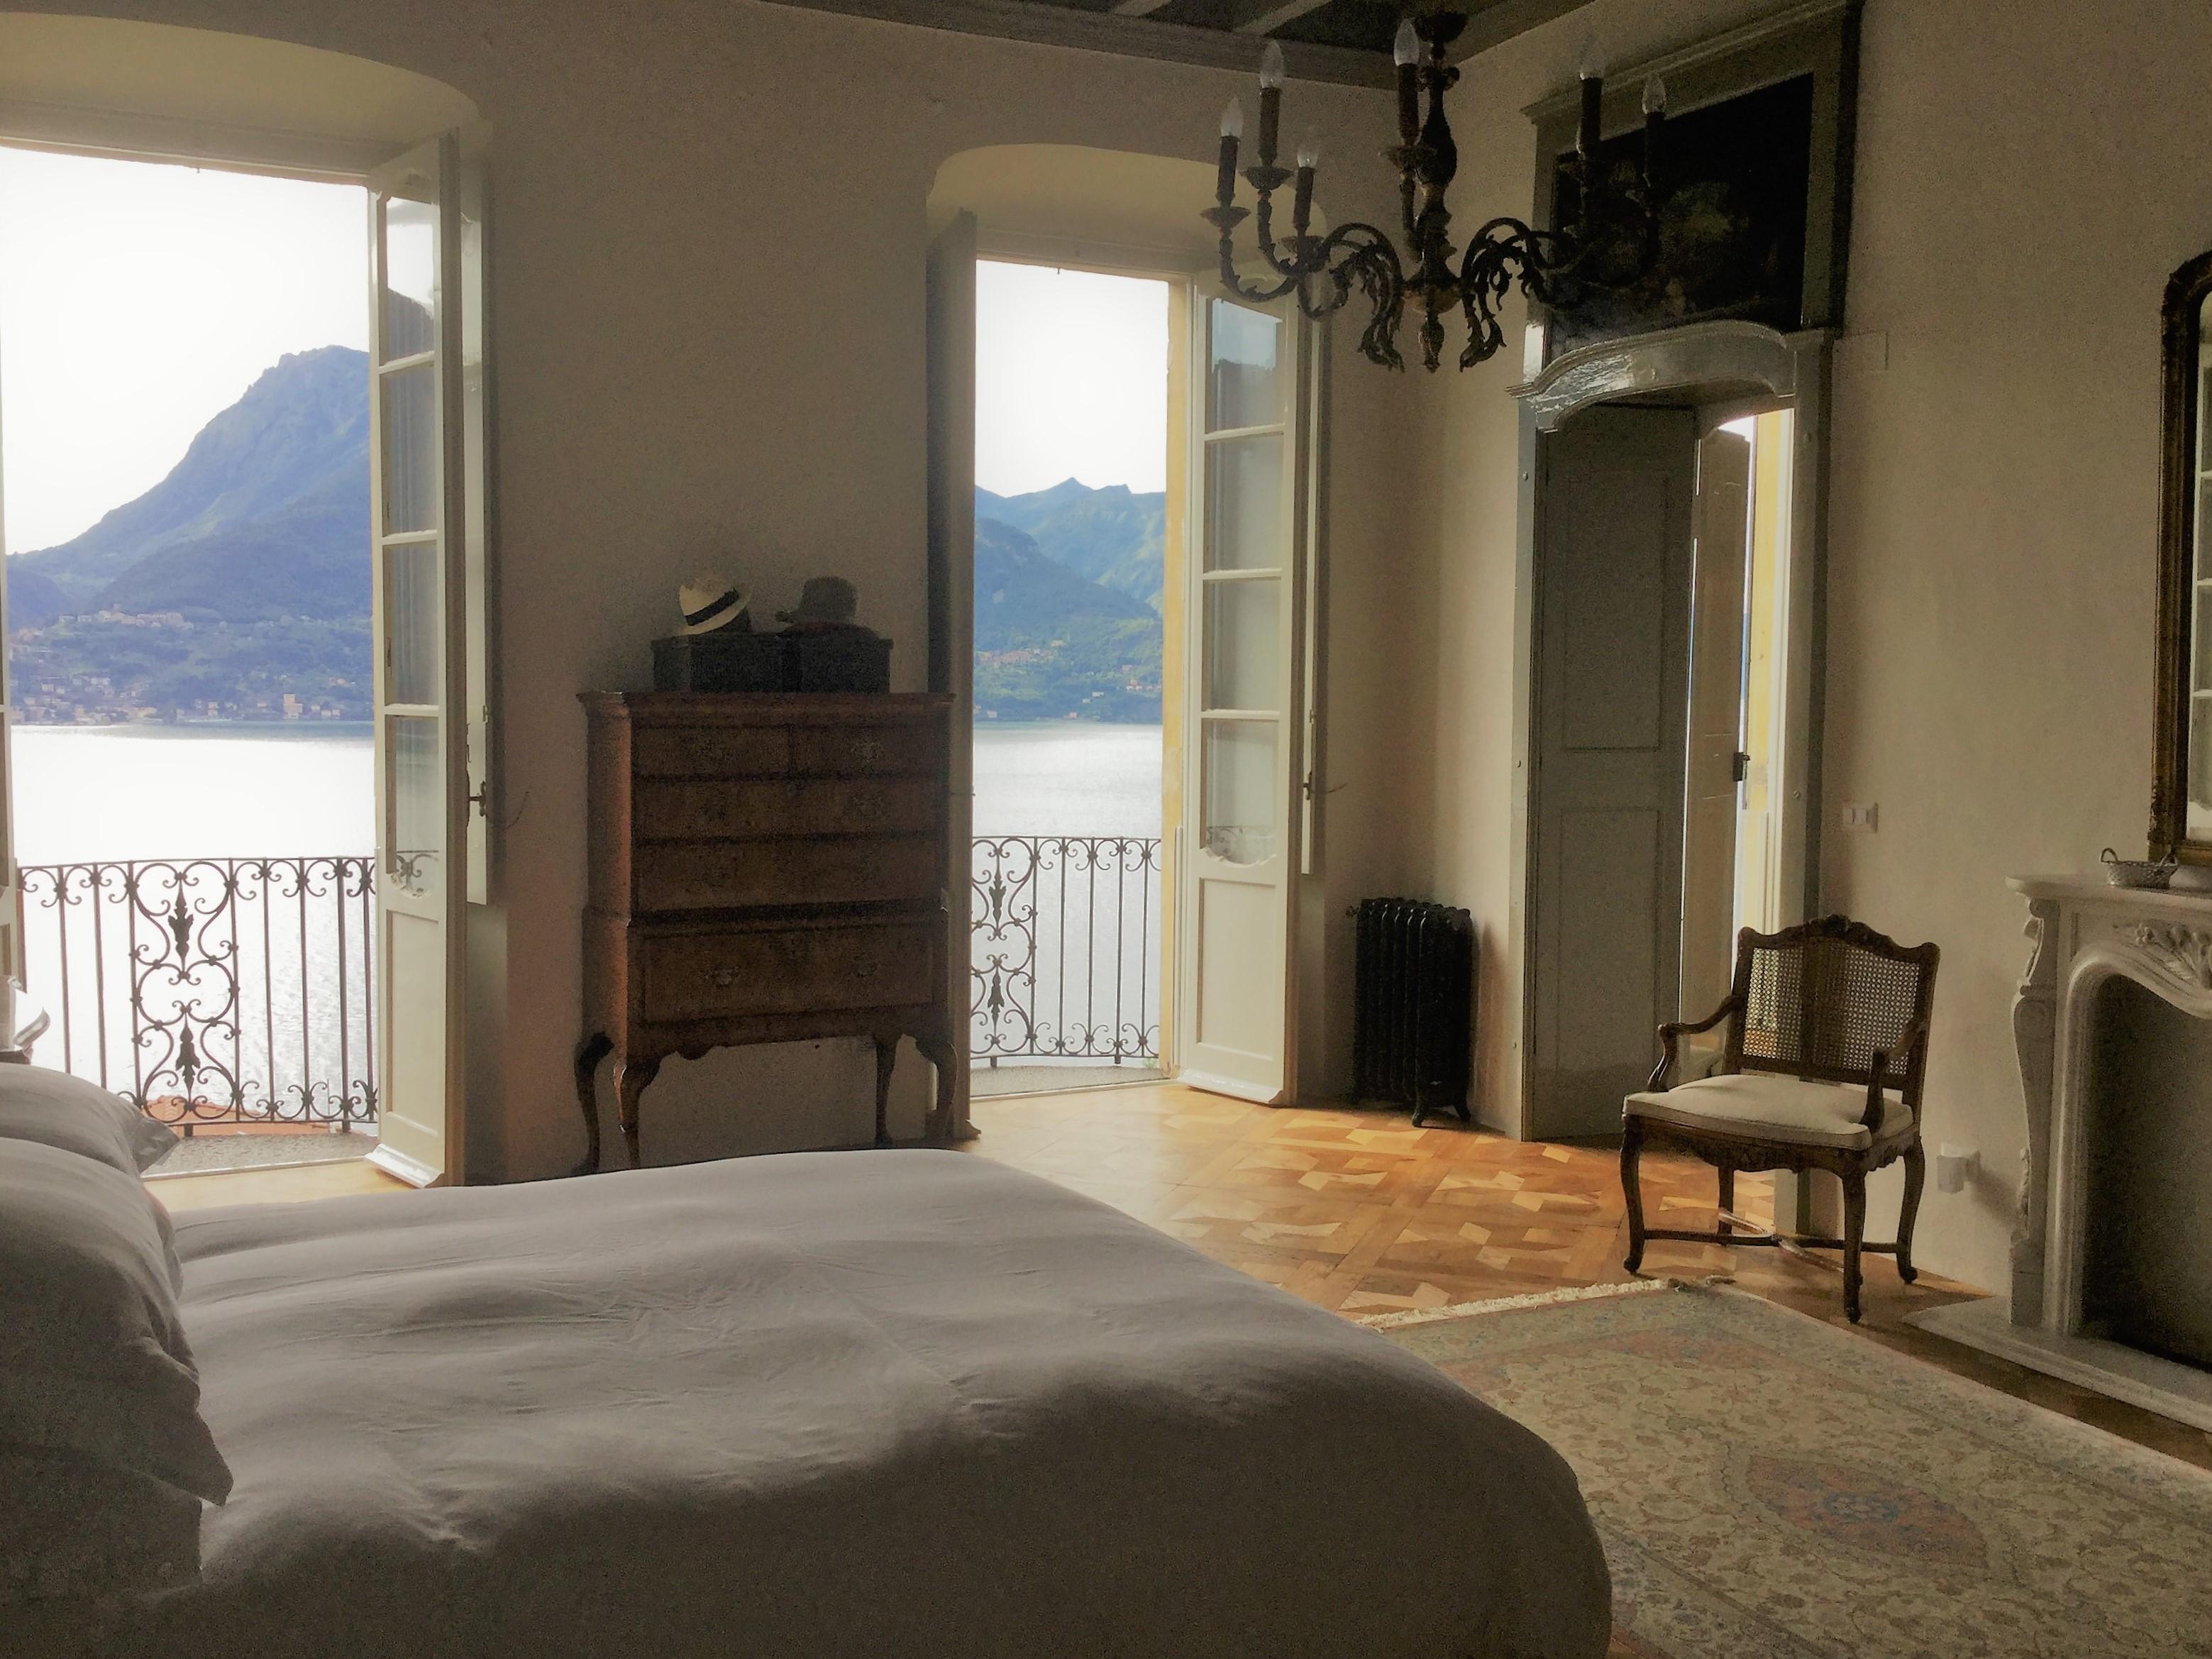 San Siro Appartamento in villa d'epoca con vista Lago Como